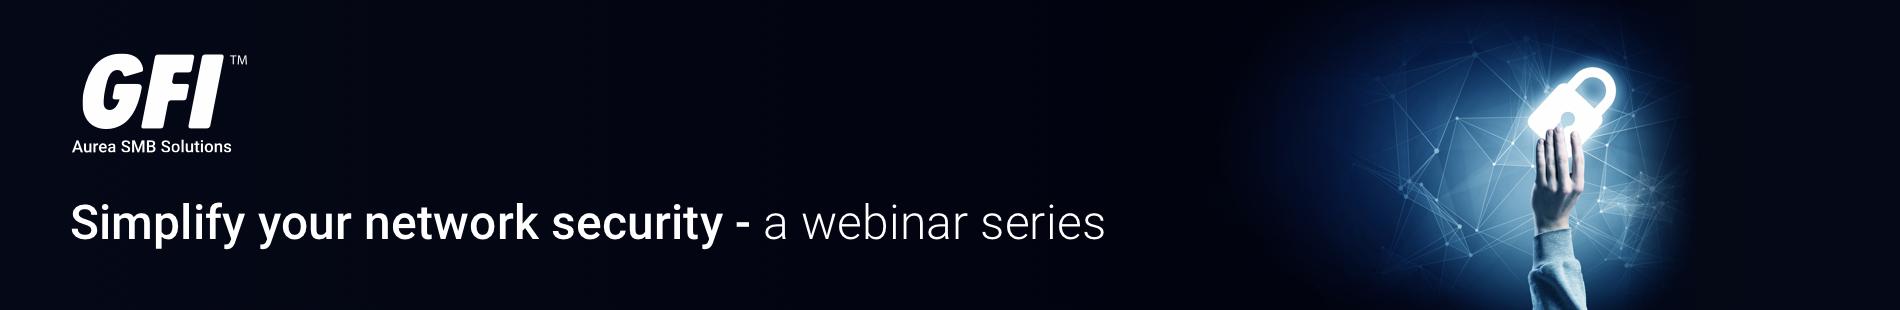 Webinar series banner